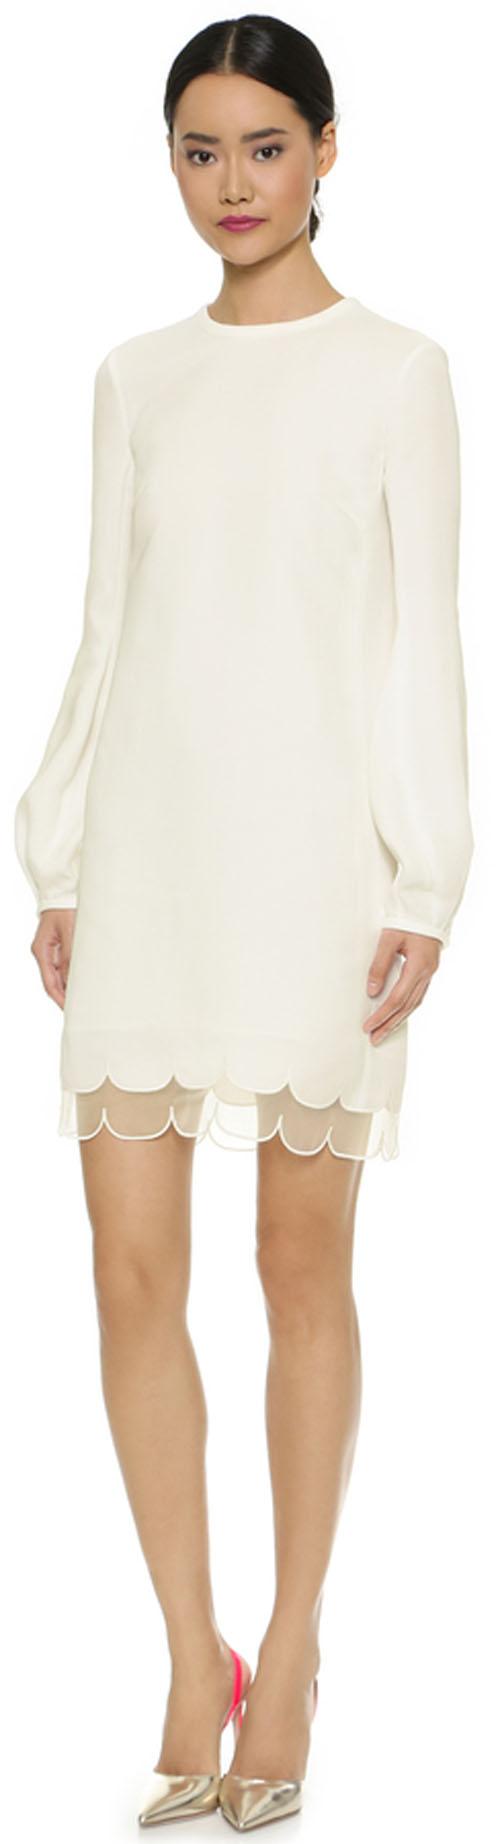 2016 new fashion trends 11 simple short wedding dresses for Valentino short wedding dress